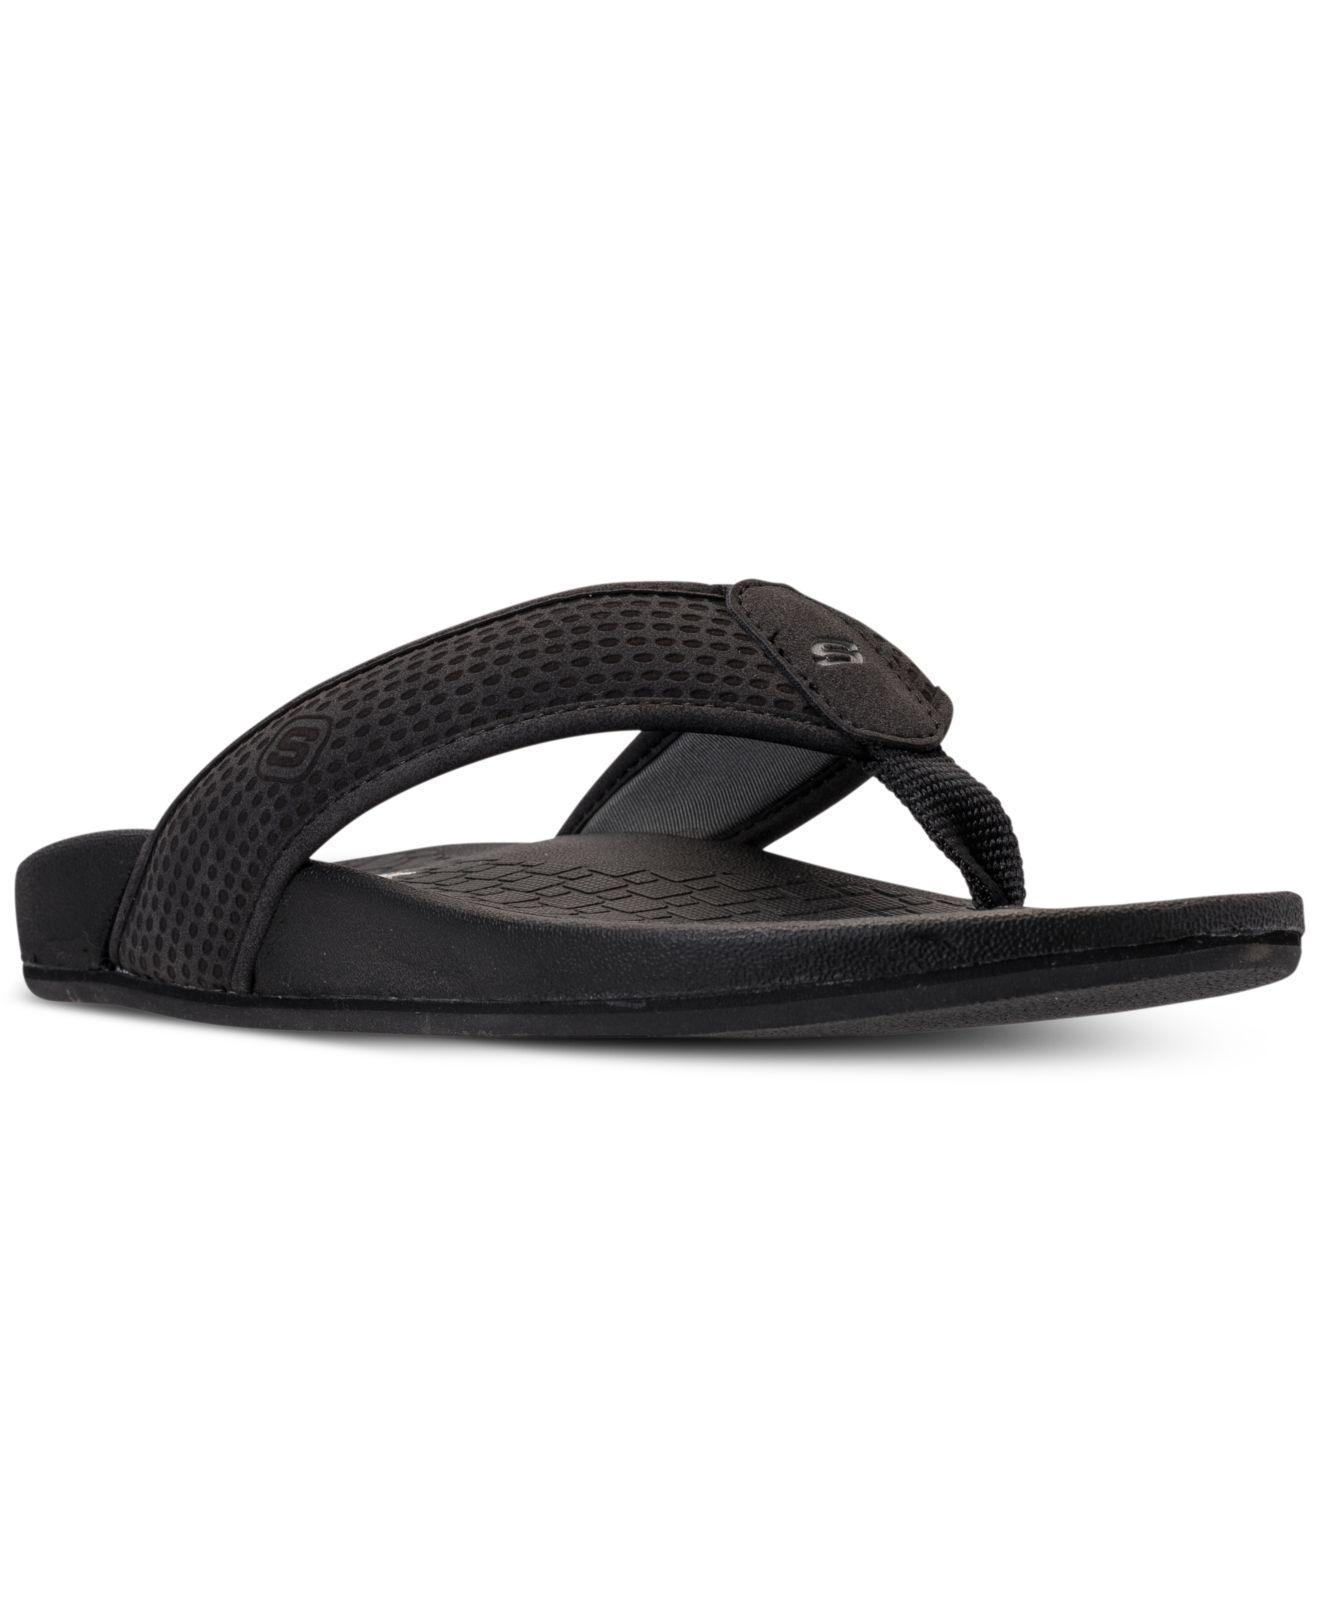 3bd3b502cbbd Lyst - Skechers Pelem Emiro Thong Sandals From Finish Line in Black ...